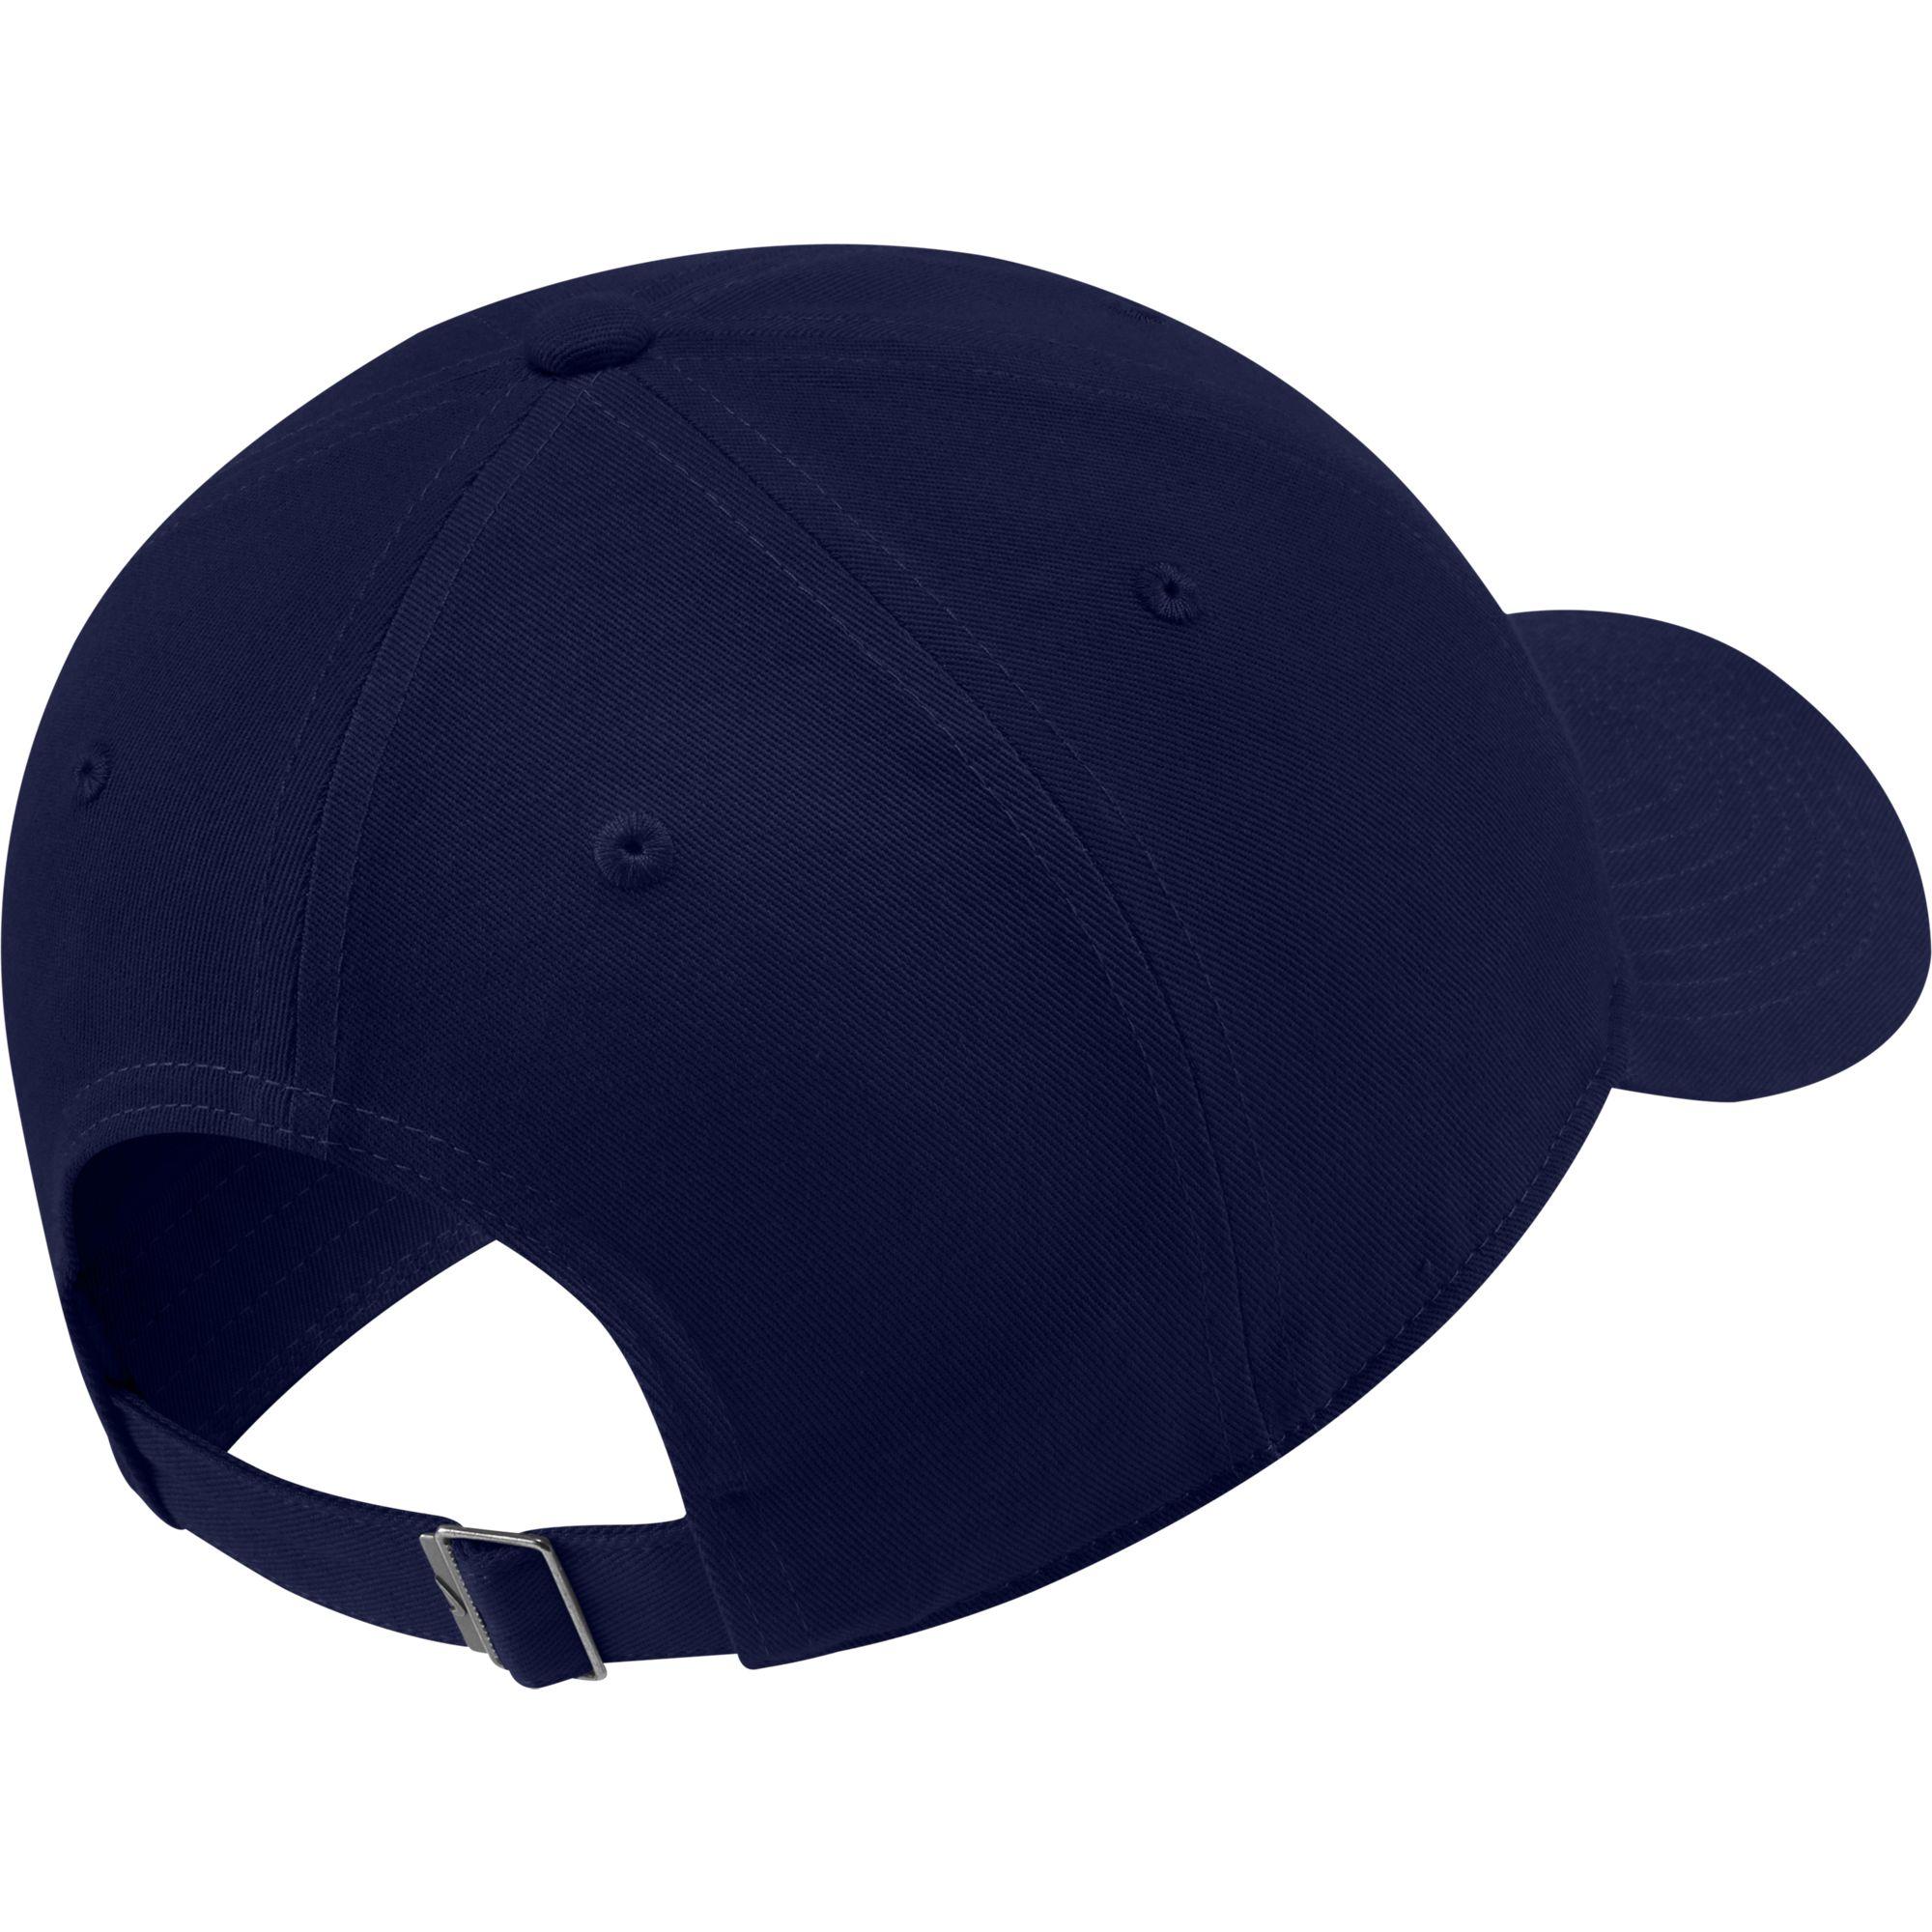 Men's Usa Nsw H86 Cap, Blue, swatch